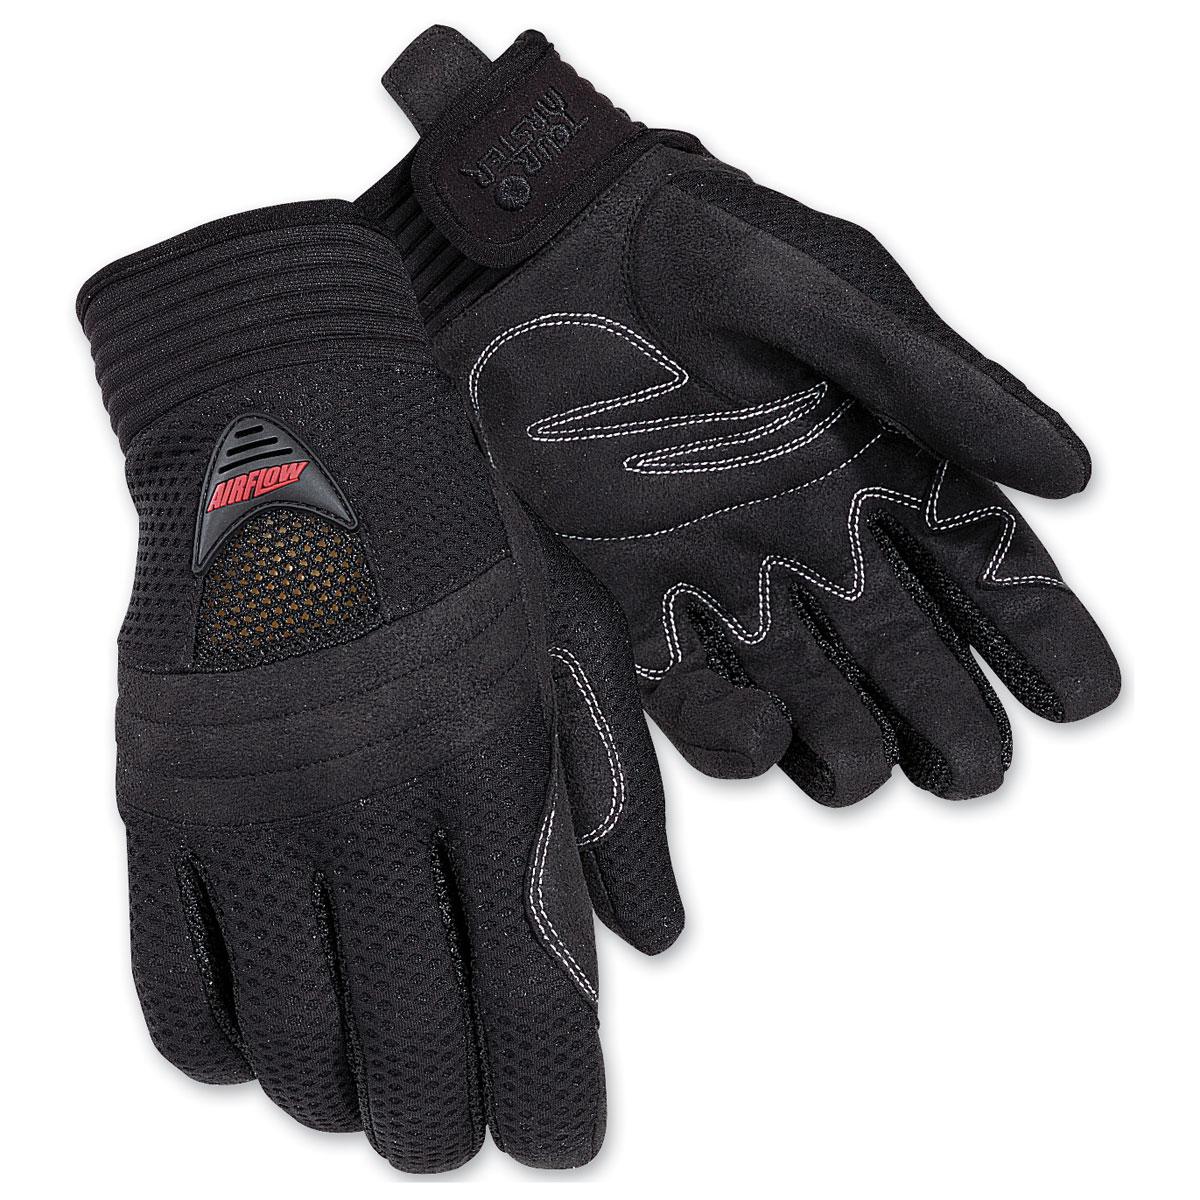 Tour Master Women's Airflow Black Gloves